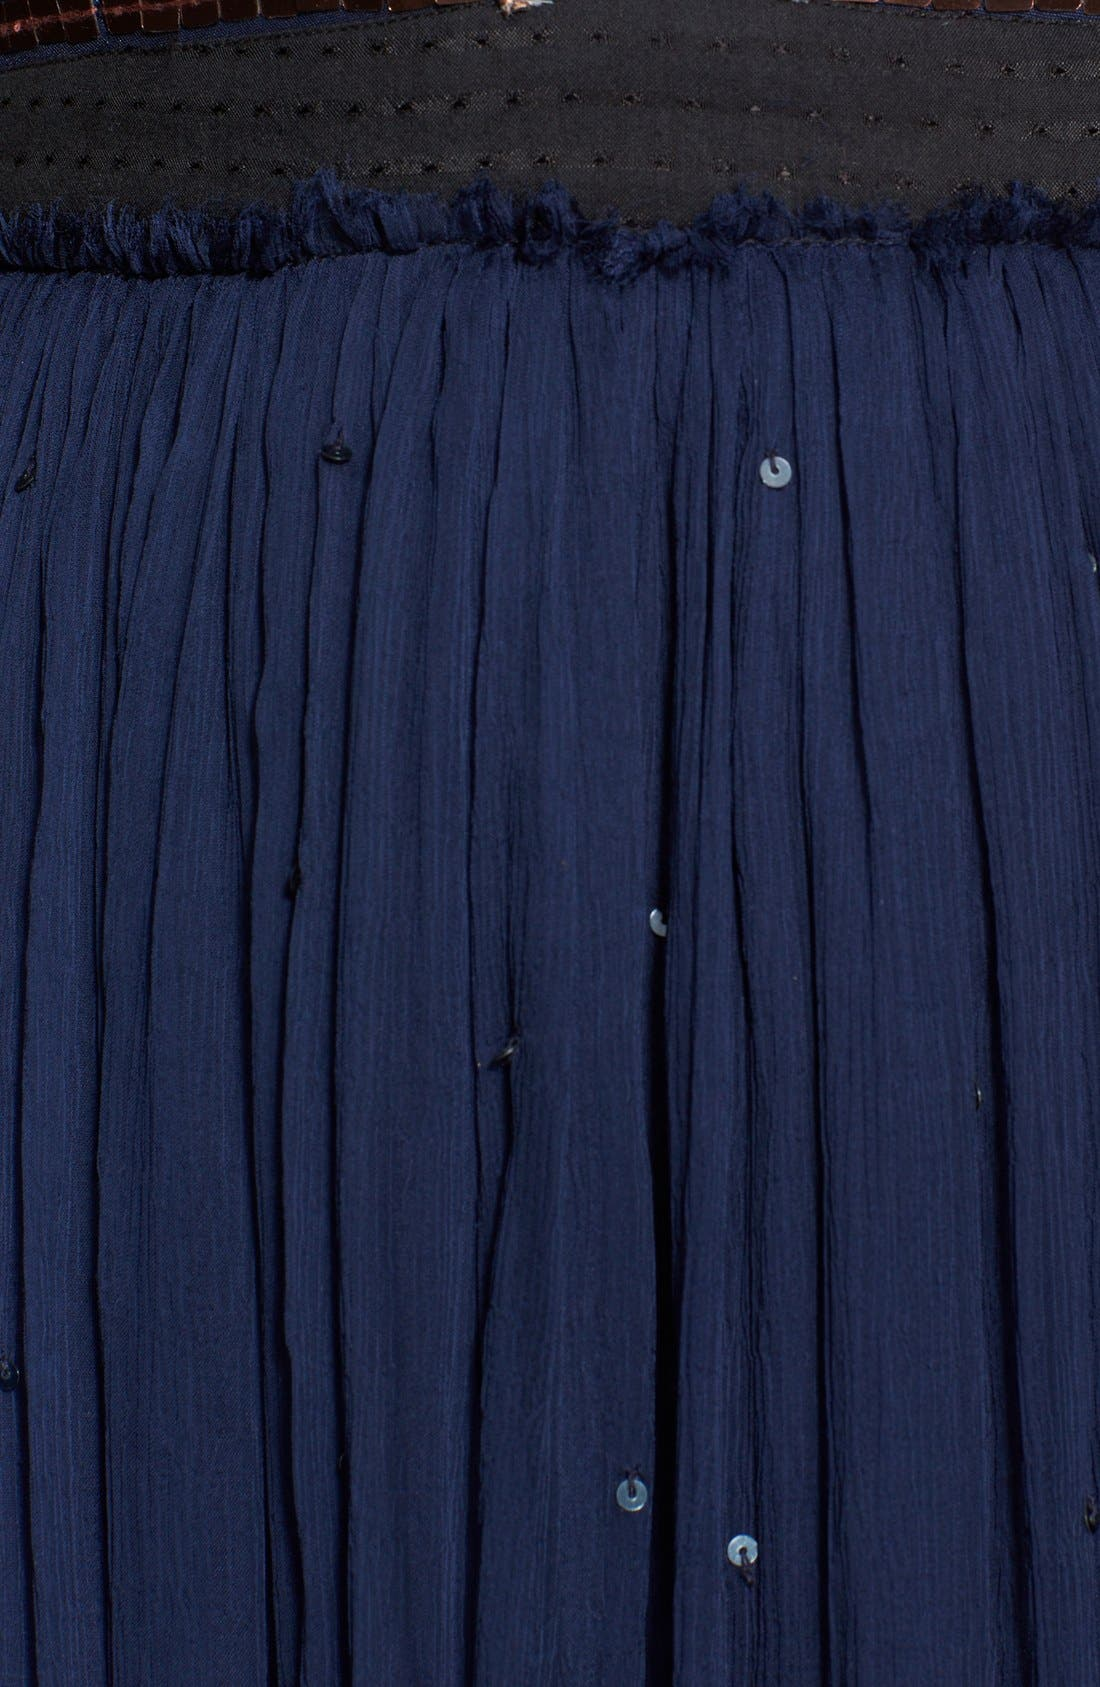 Embellished Chiffon Maxi Dress,                             Alternate thumbnail 2, color,                             409